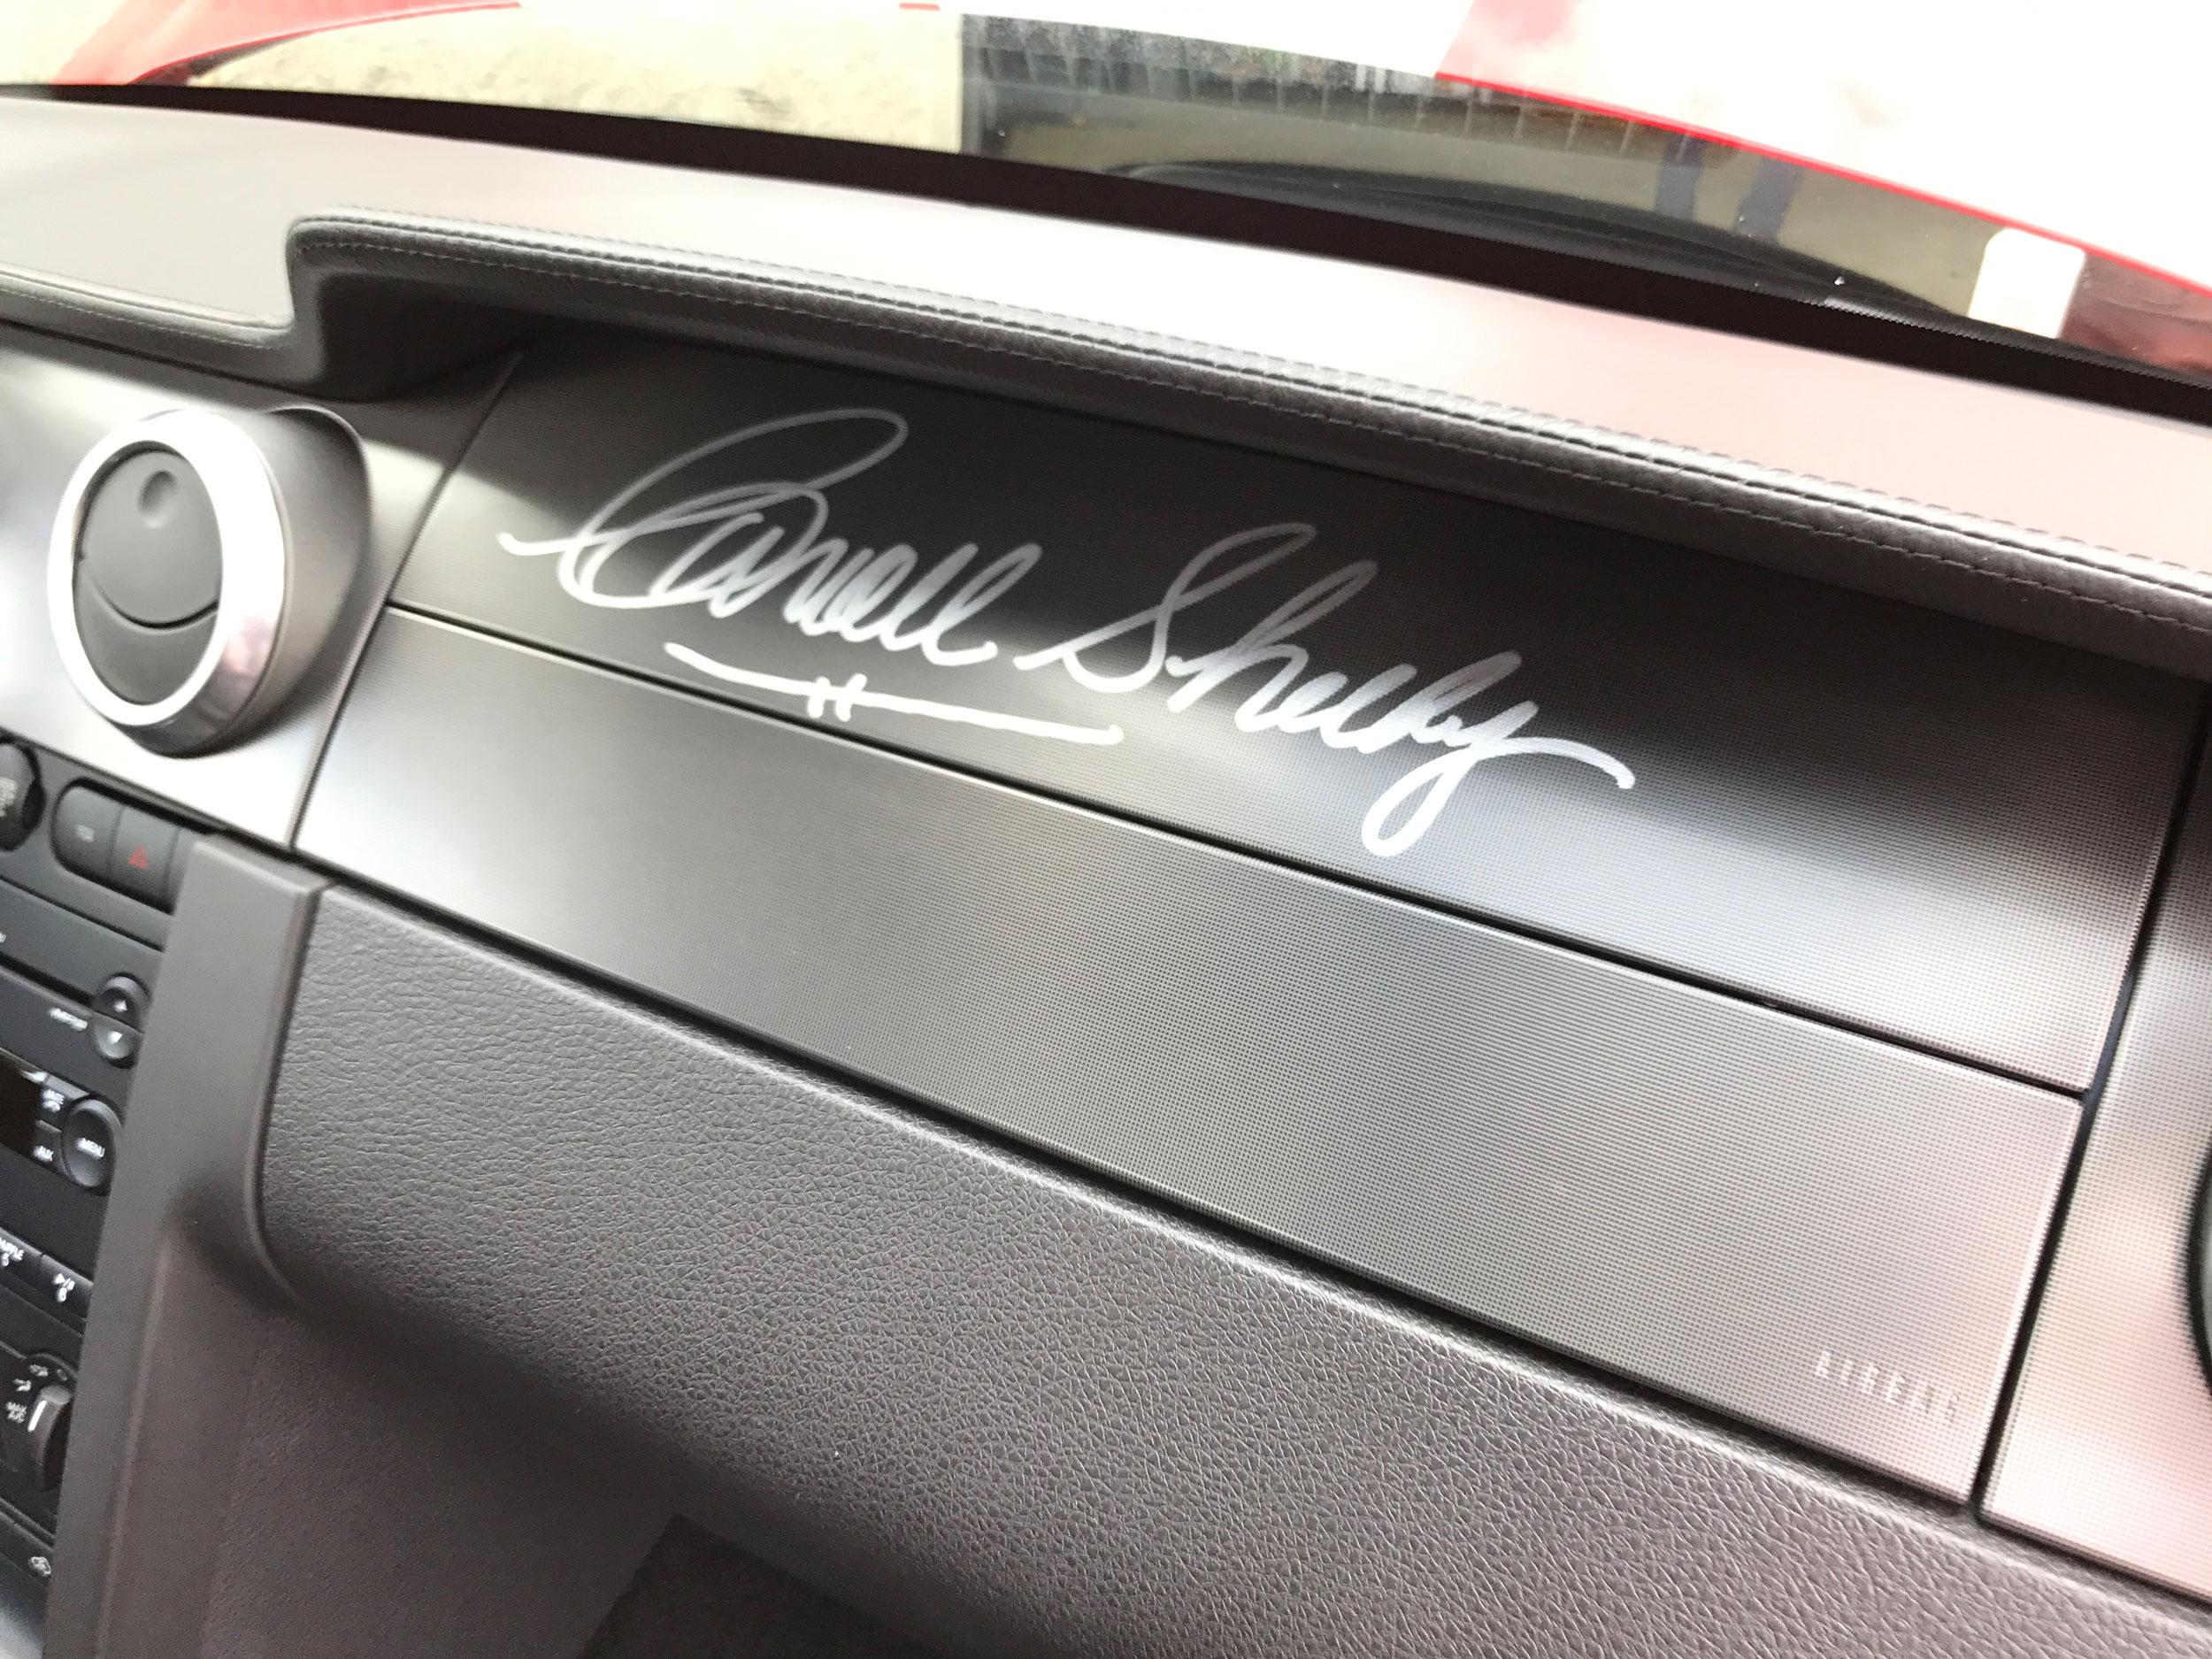 Shelby-Cobra-Jun-09-2017.jpg